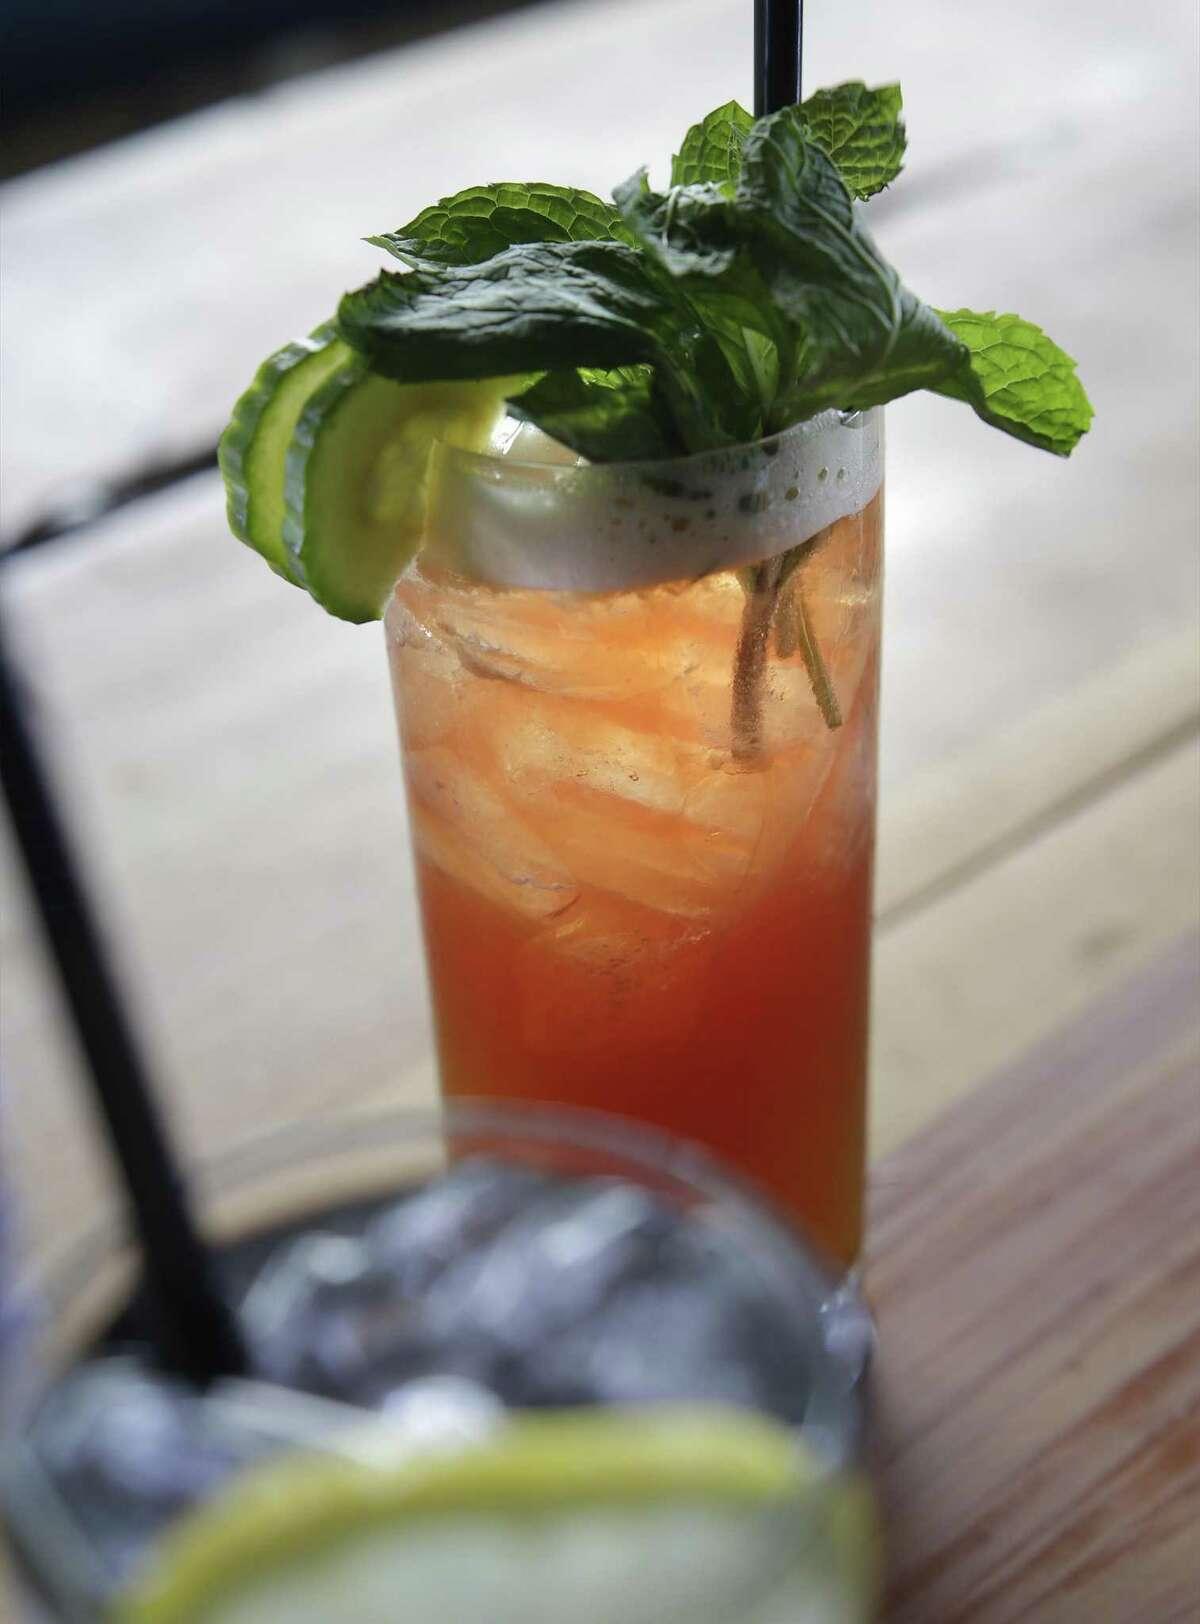 The Fixed Element cocktail with Pimm's No. 1, raspberry, cucumber, jasmine-hibiscus kombucha, lemon and sumac.